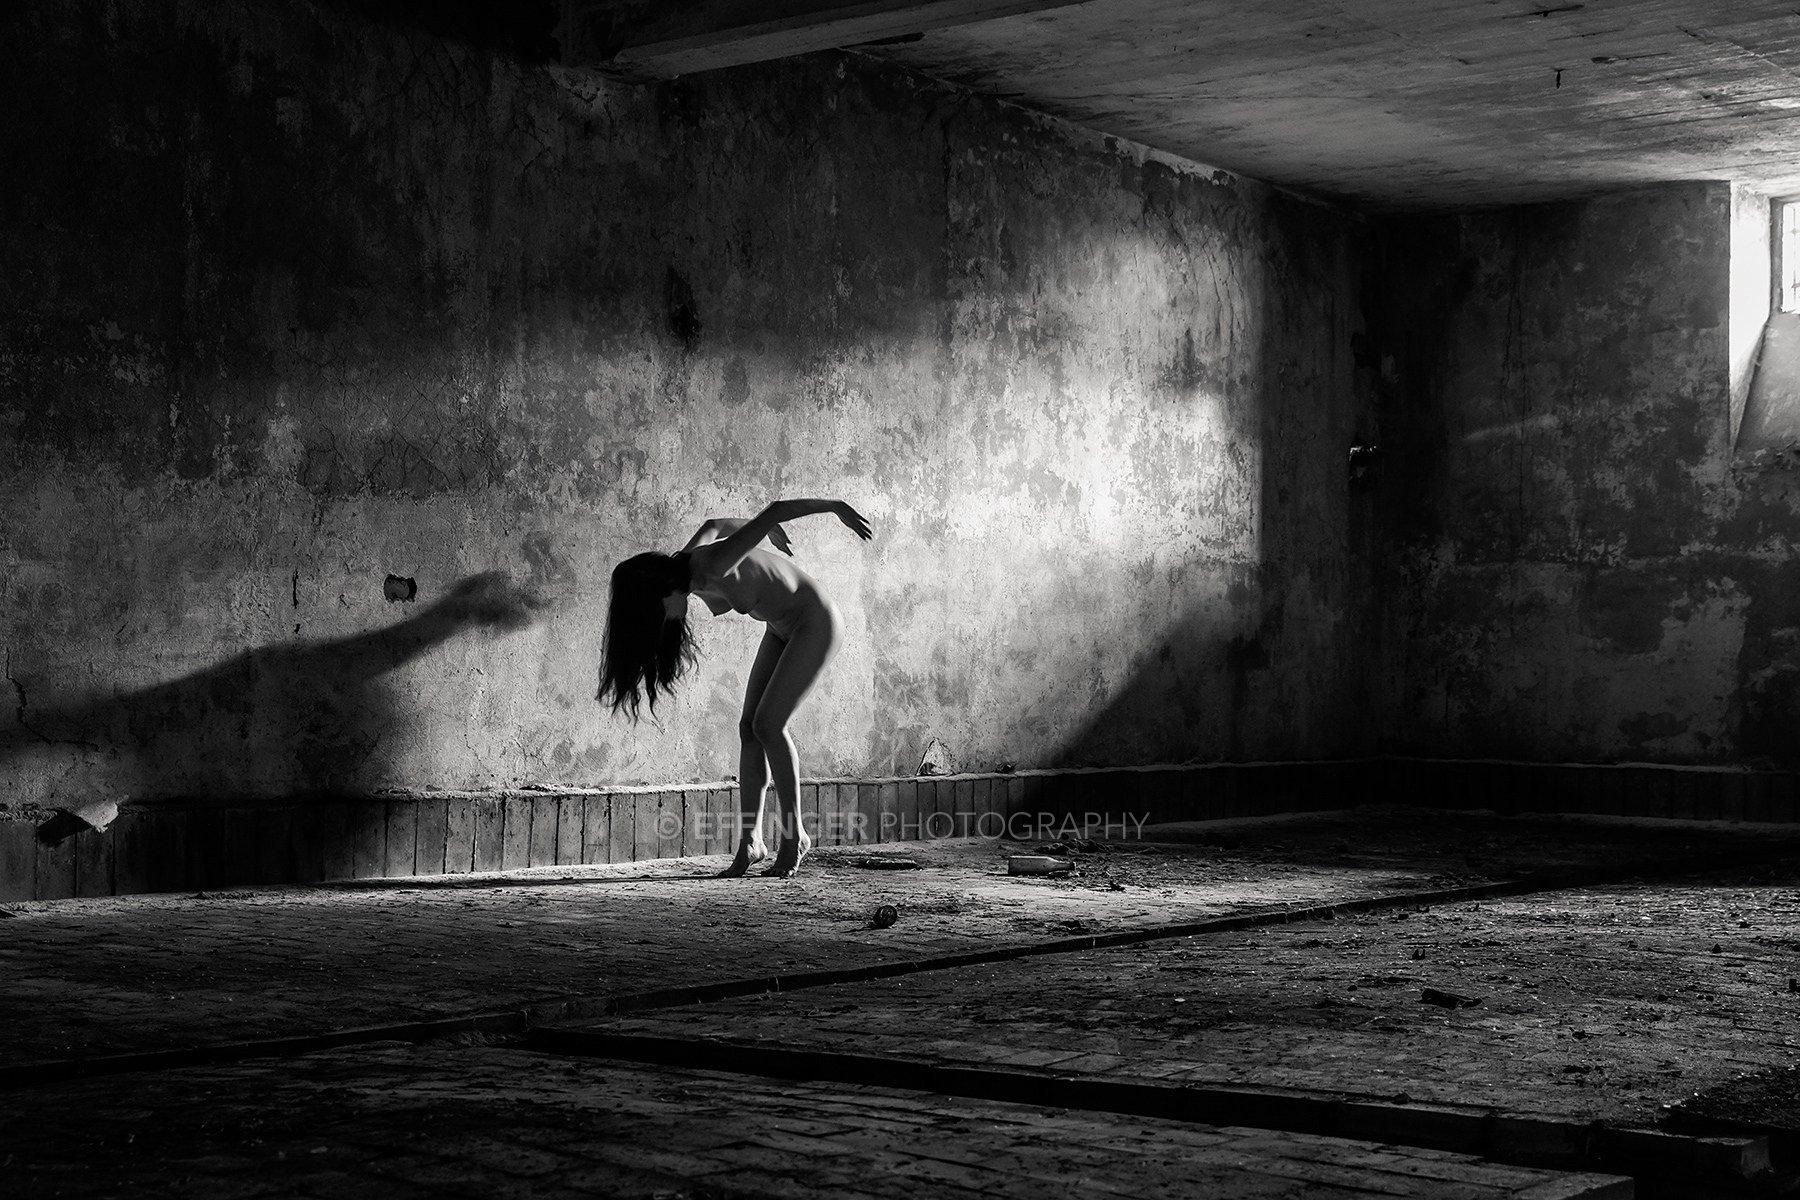 Nude Art - Aktfotos Leipzig: Lost Place Shooting #0934